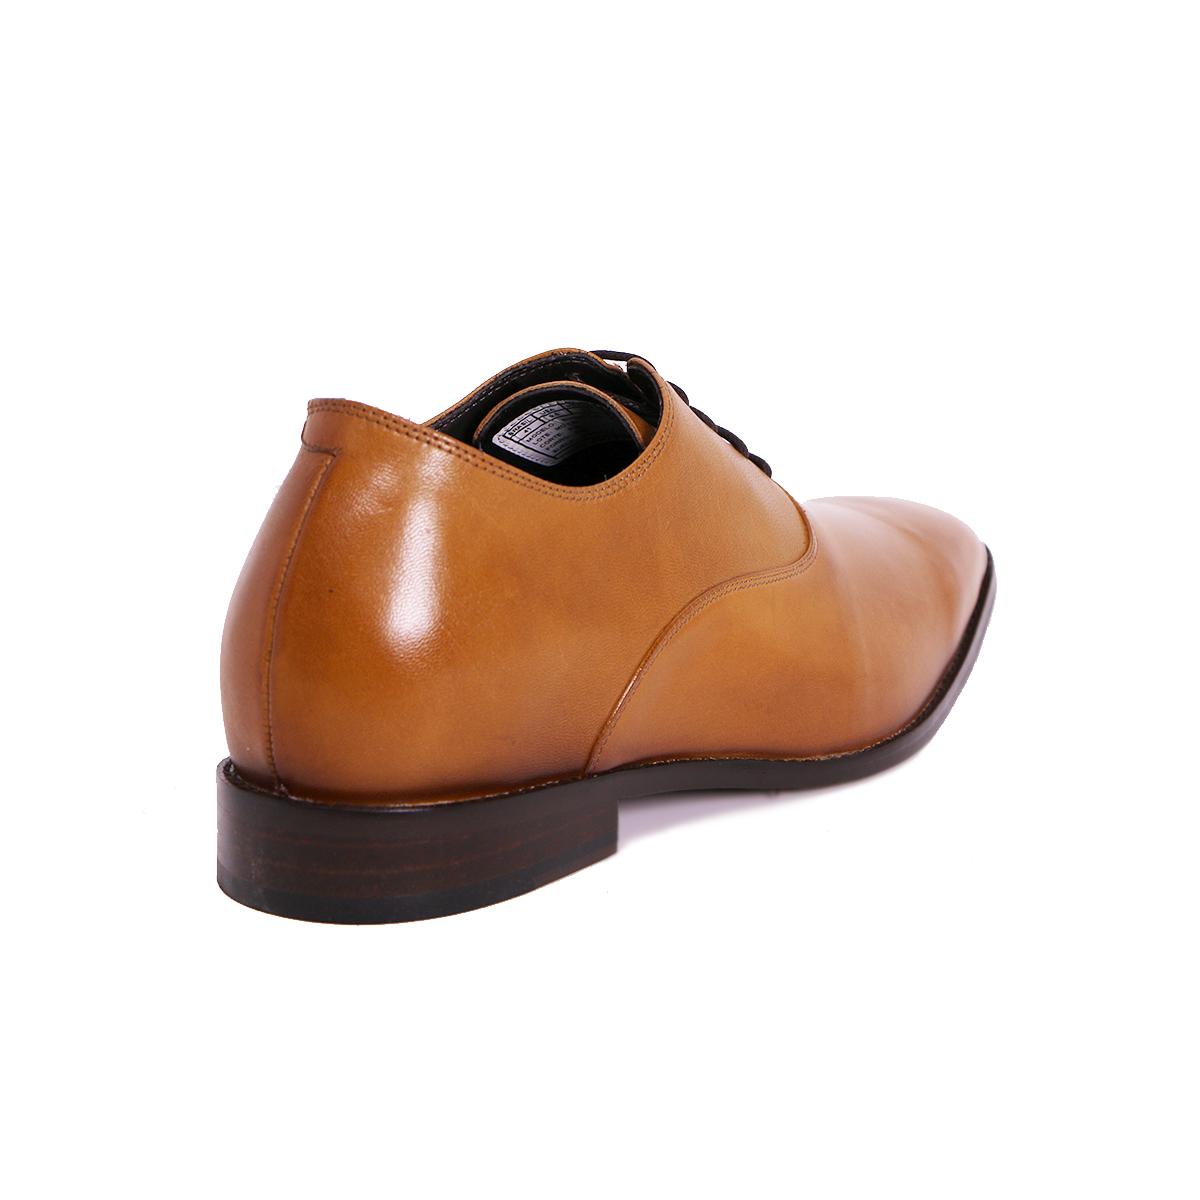 Zapato Formal Elegant Café Claro Max Denegri +7cm de Altura_72719